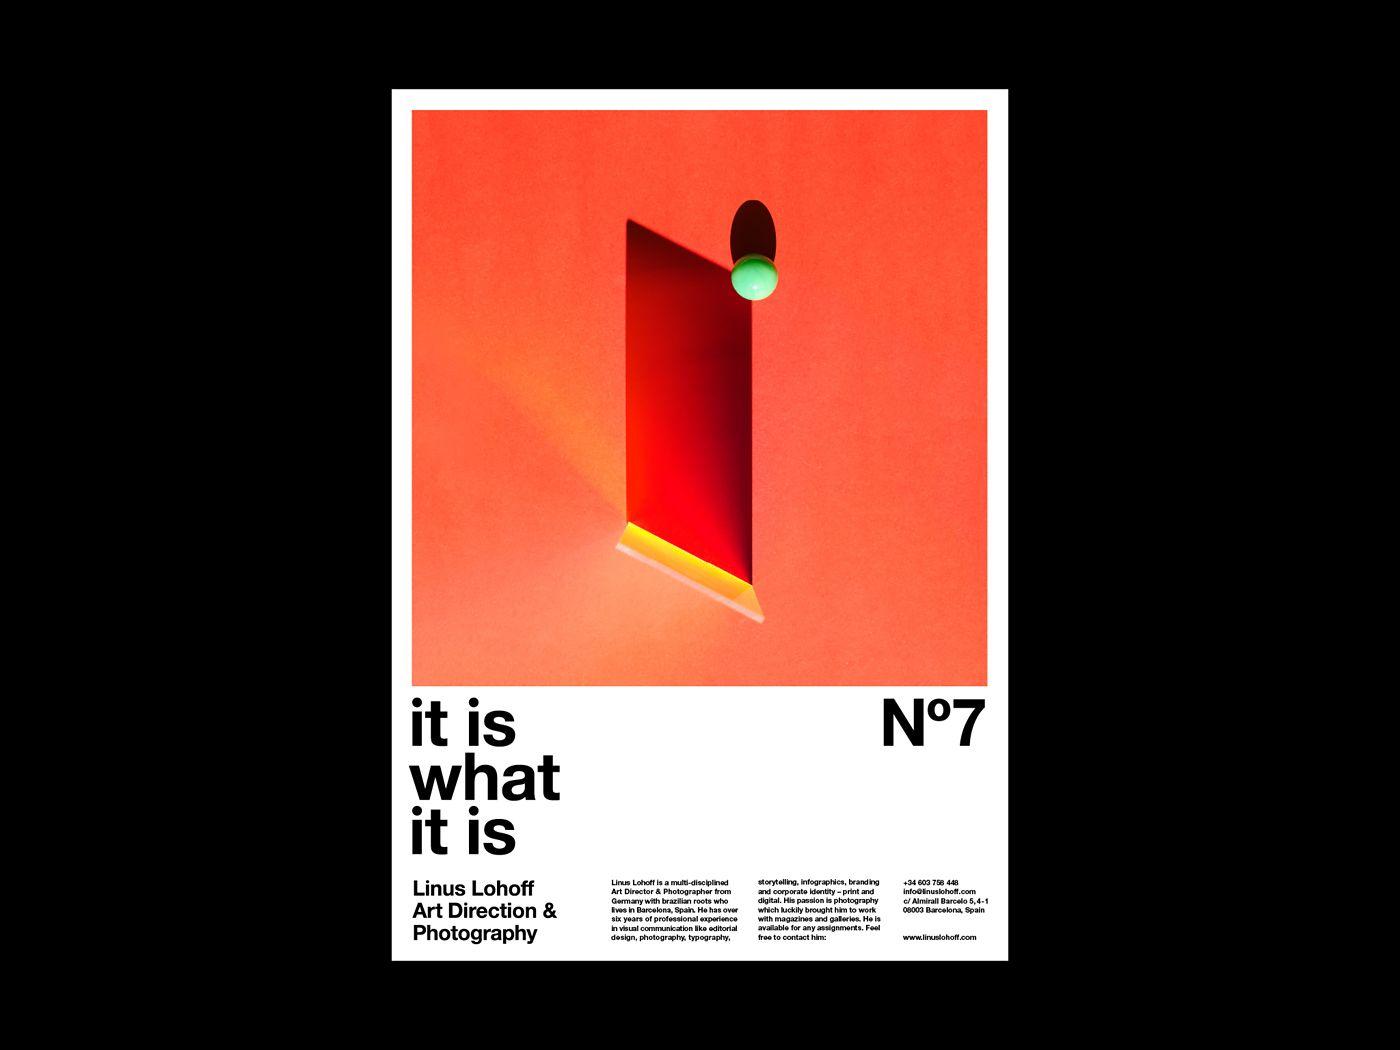 It is what it is 抽象攝影的系列海報 | MyDesy 淘靈感